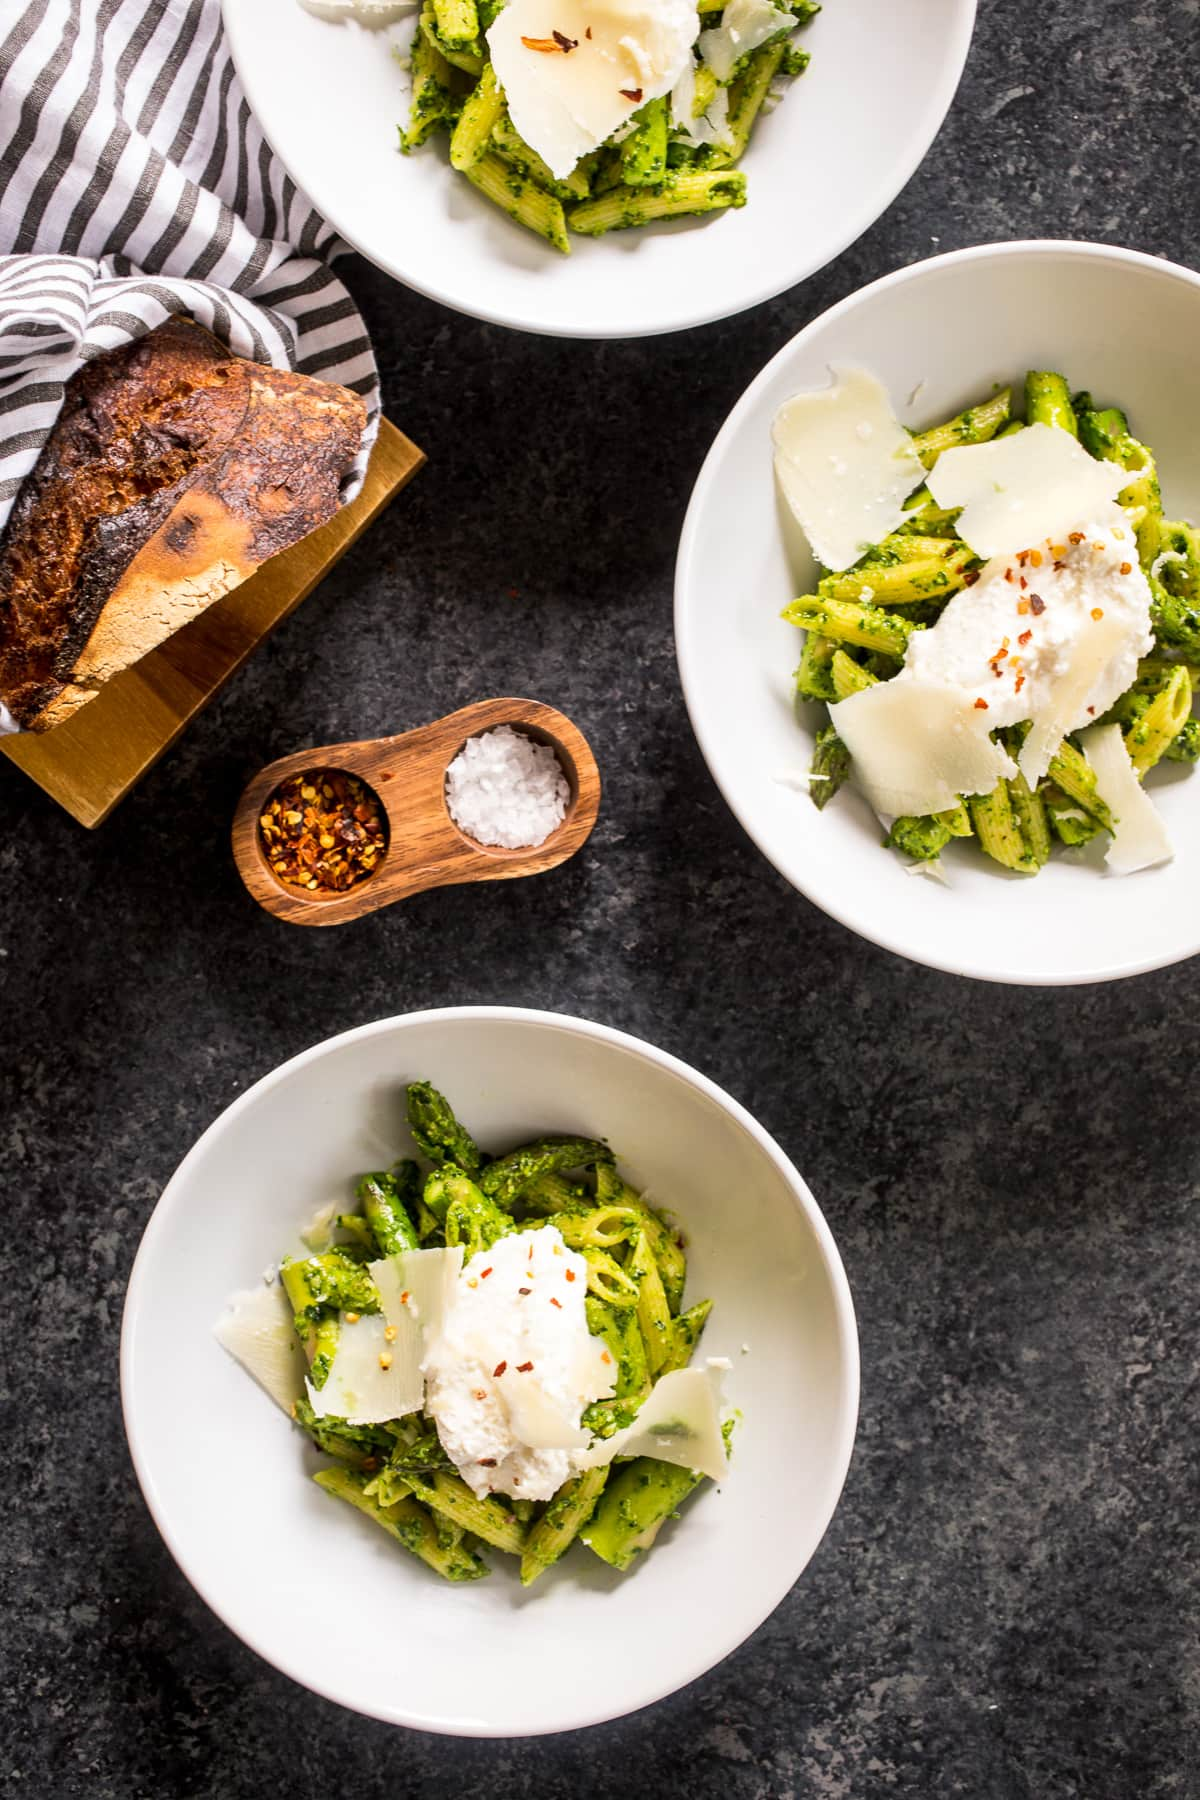 Pasta with Asparagus and Ramp Pesto